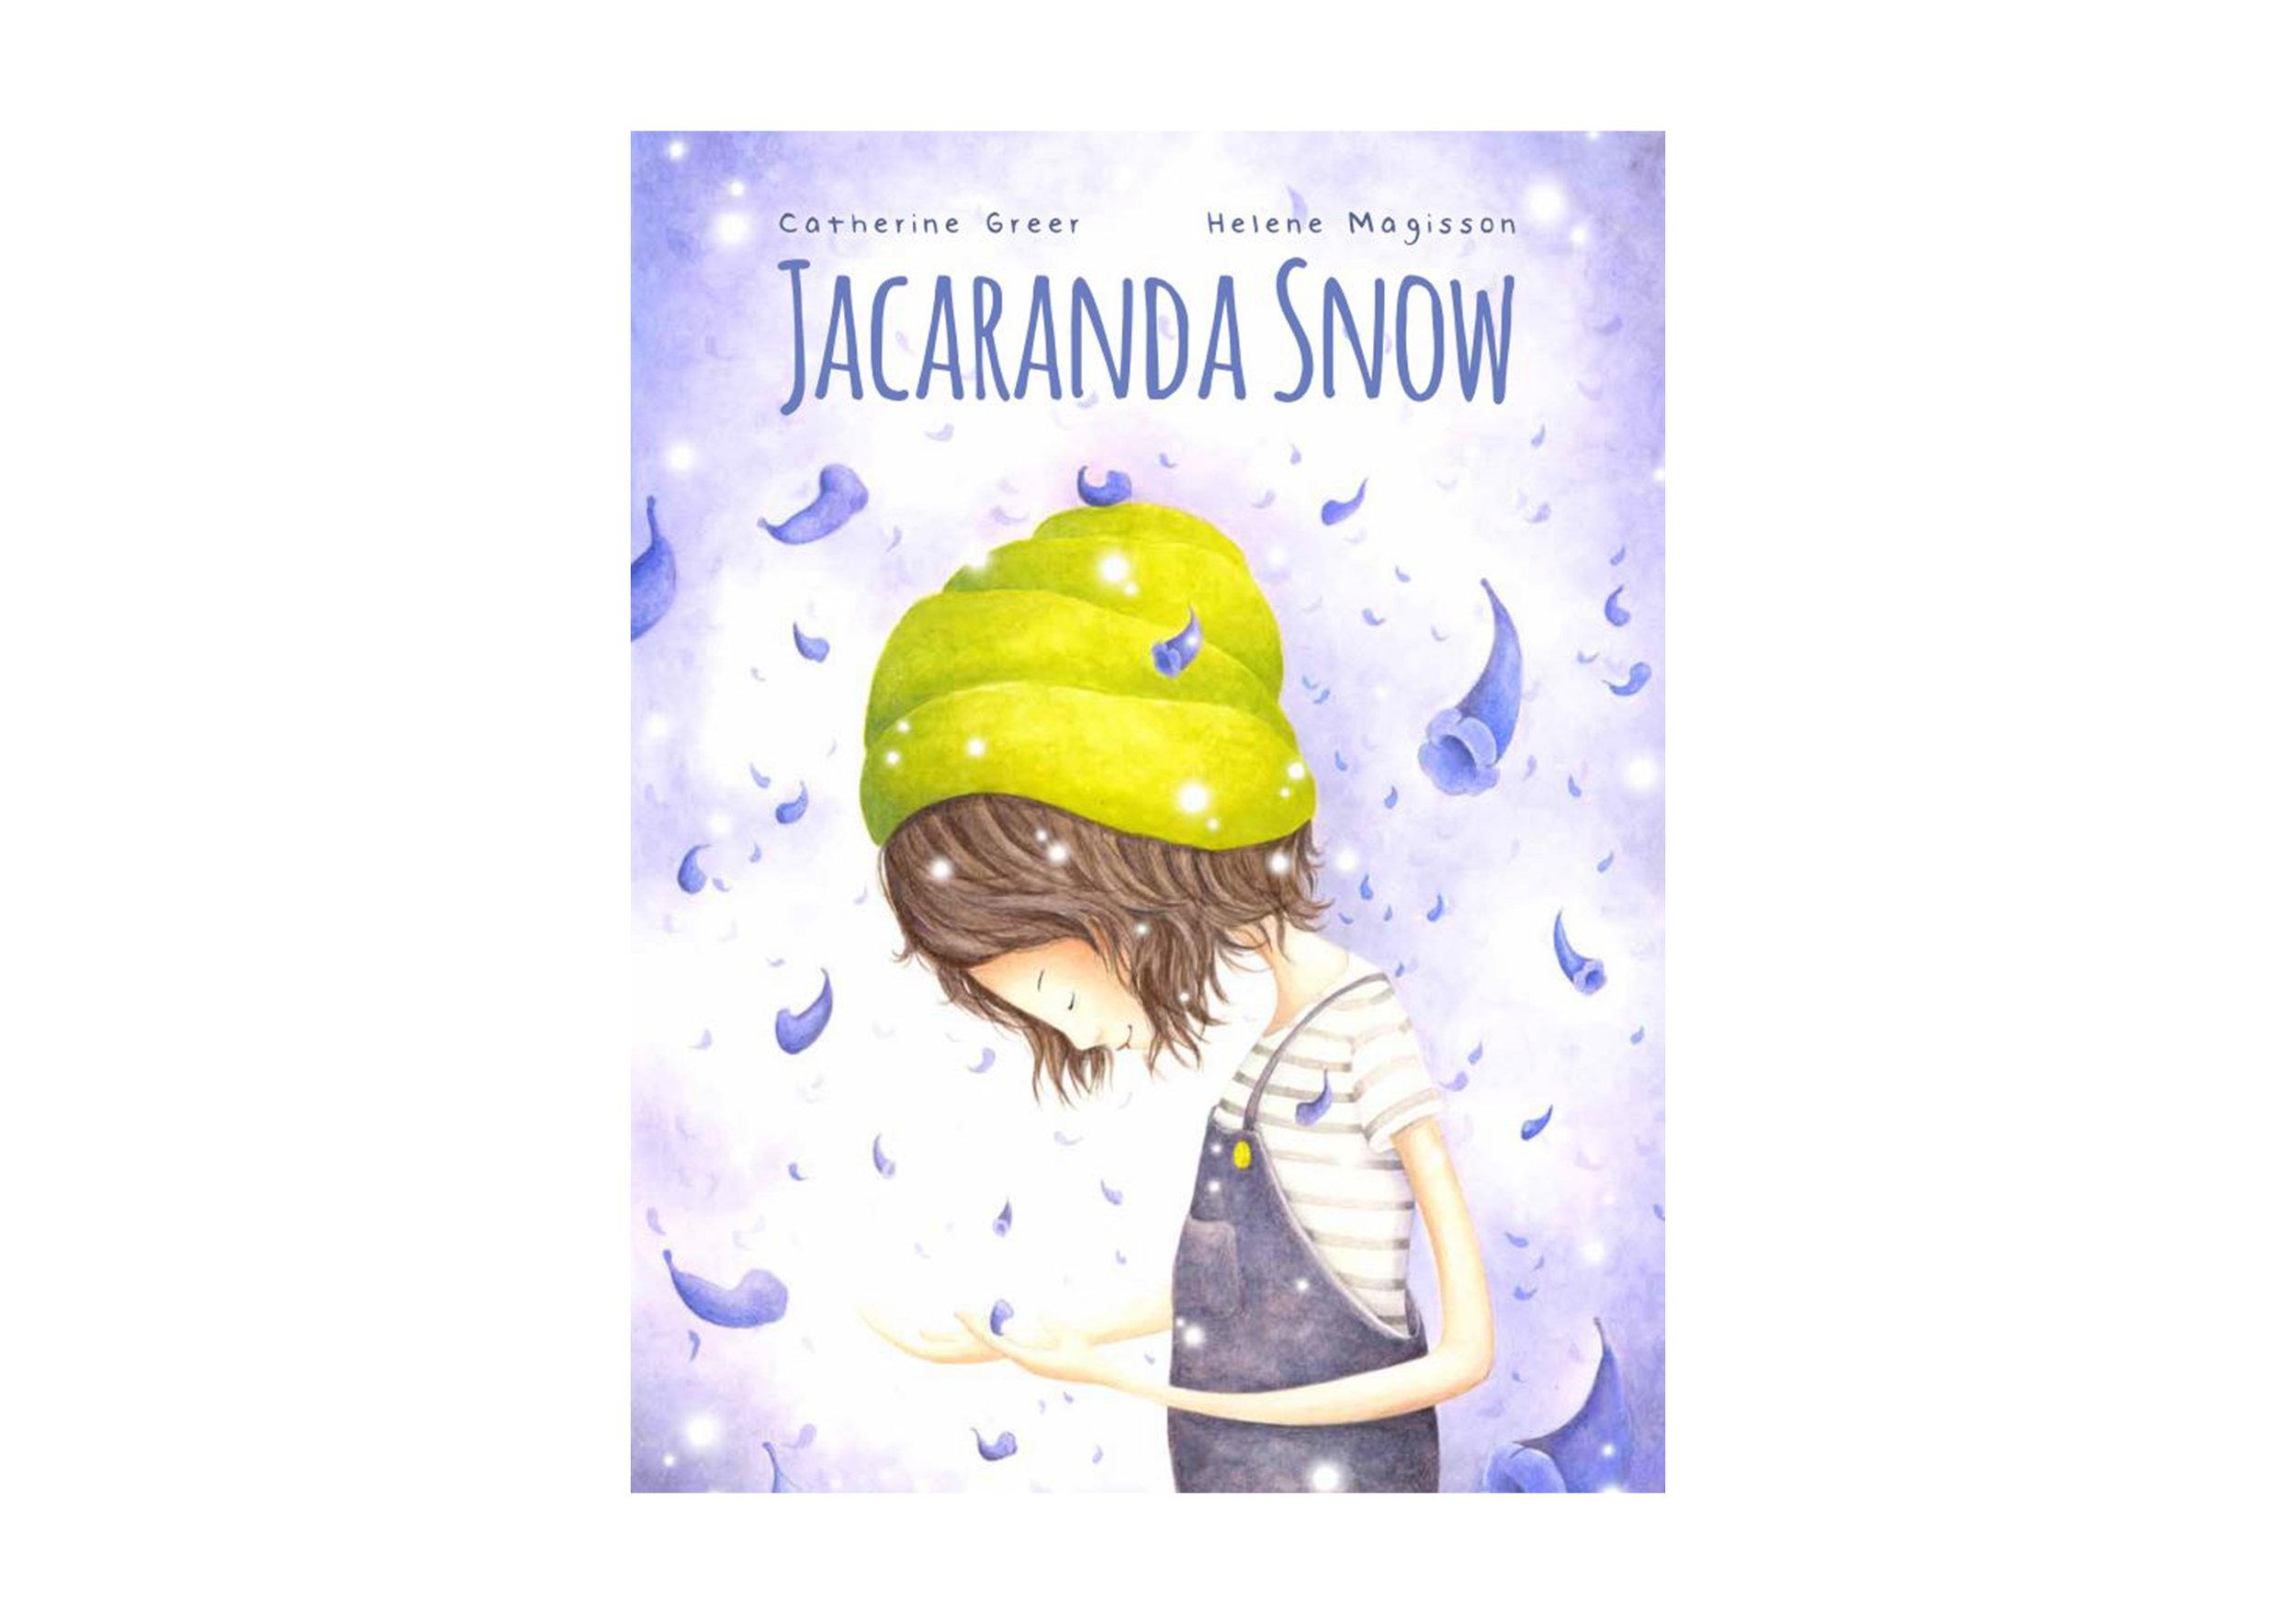 Jacaranda snow cover edited.LR.A3.jpg